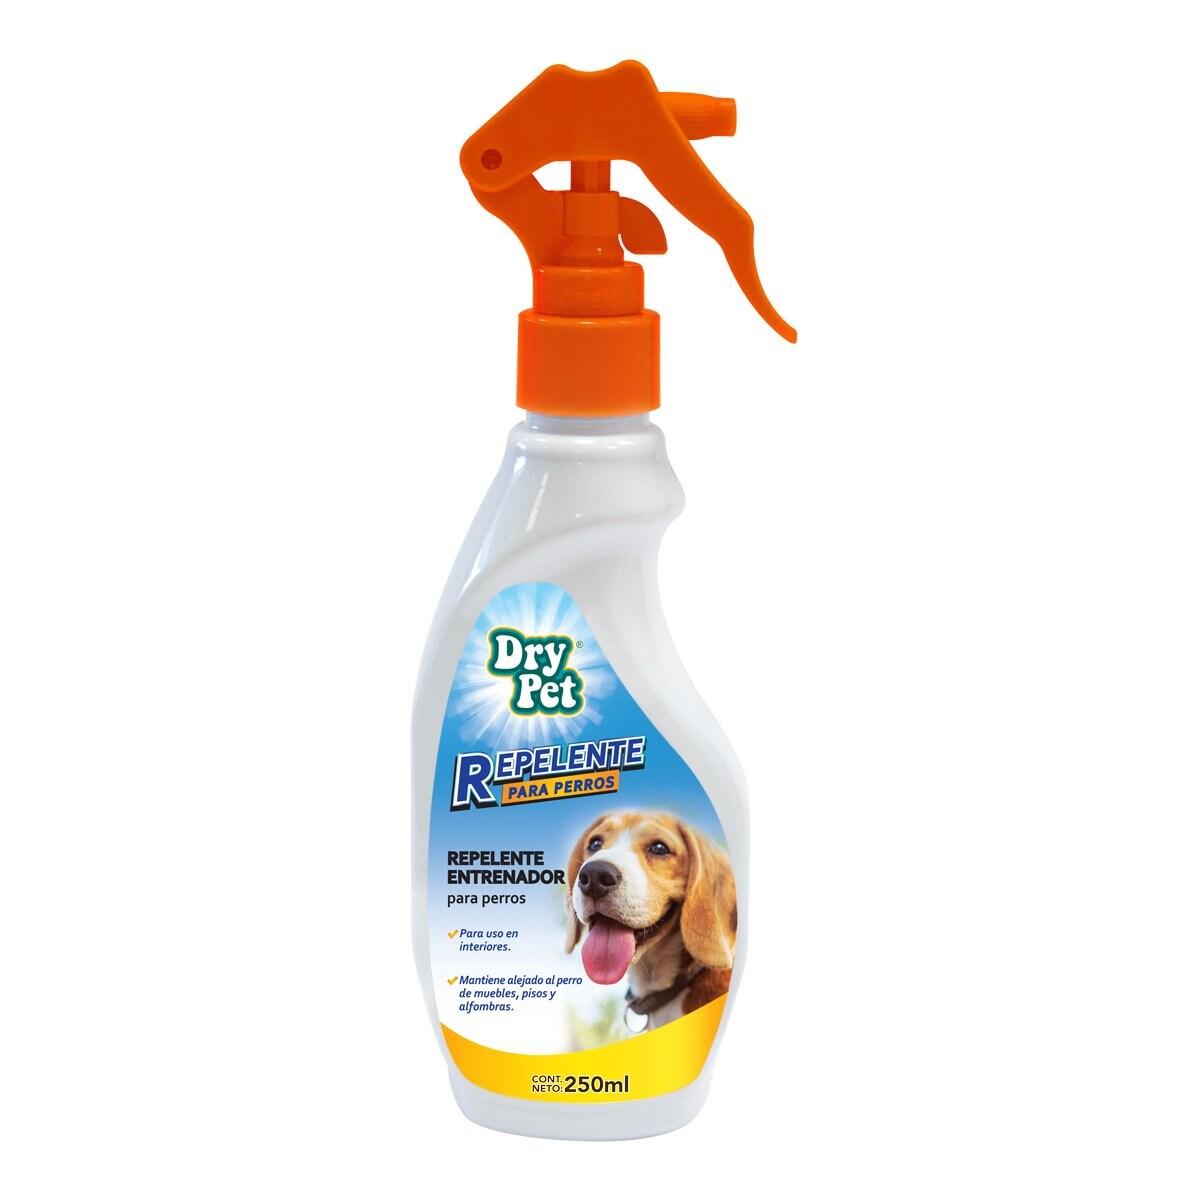 Repelente P/perros Dry Pet 250 Ml Dry Pet Mod. Fl3909